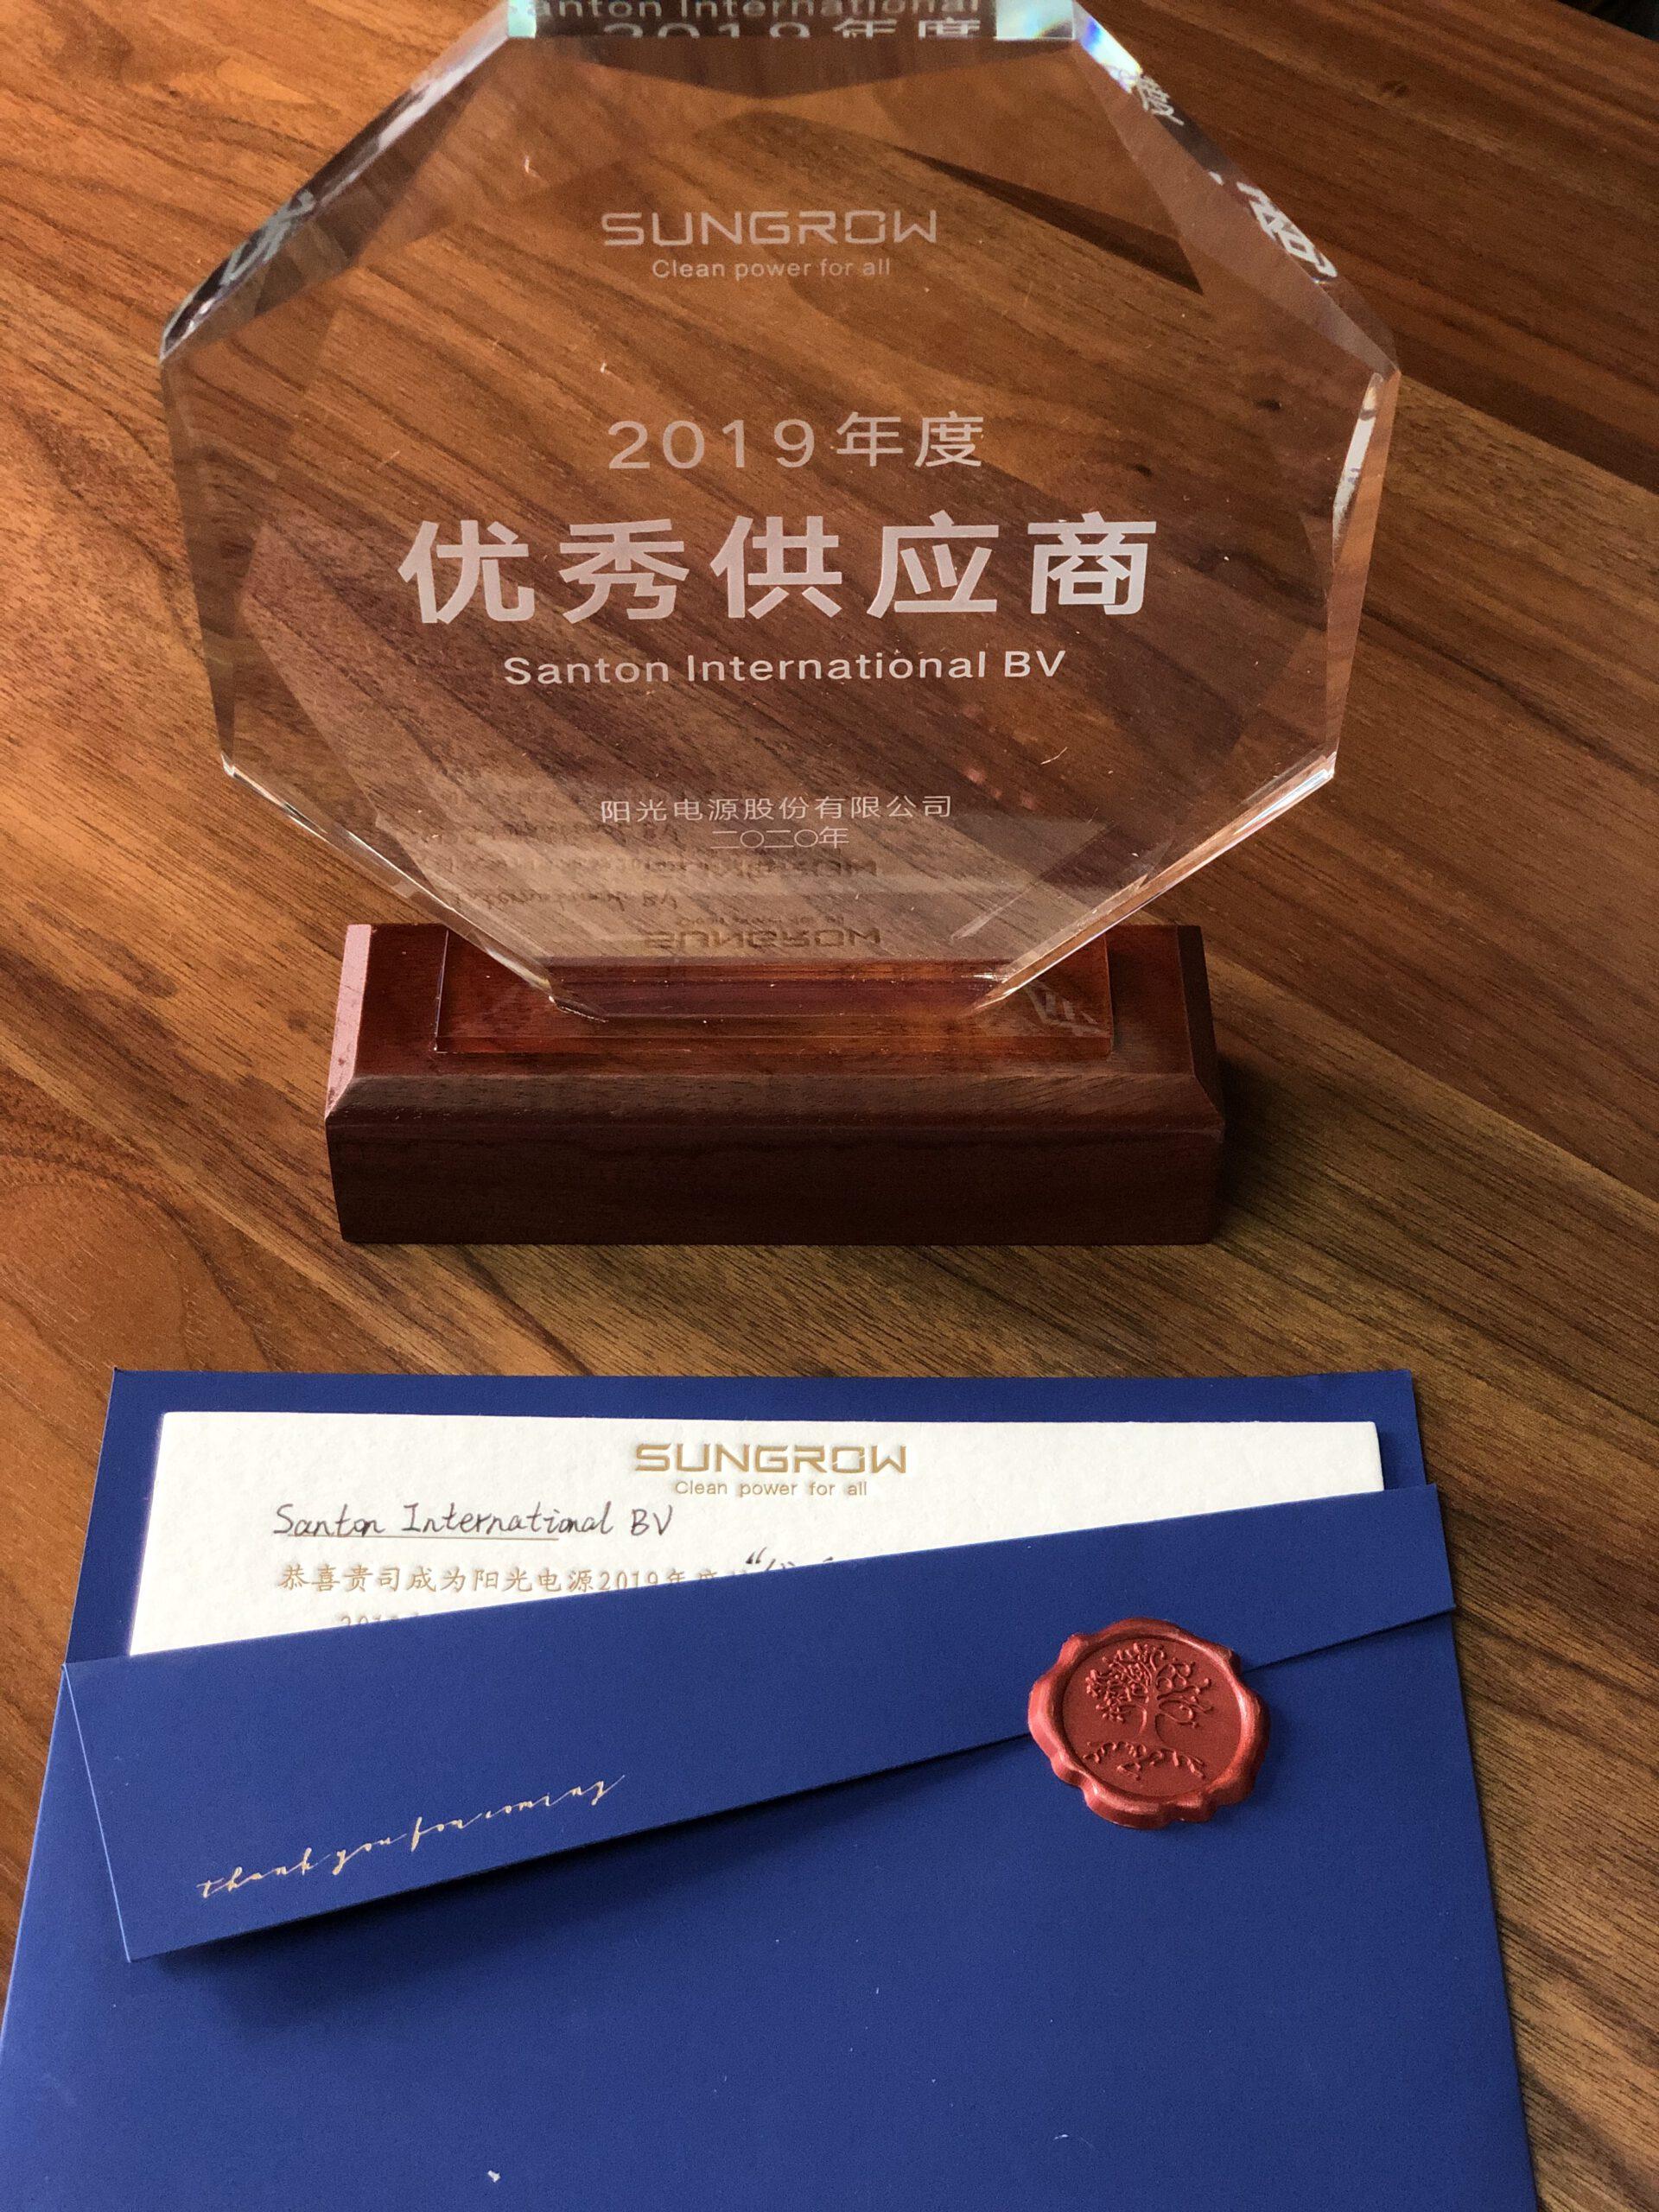 Santon wins best supplier award Sungrow 2019